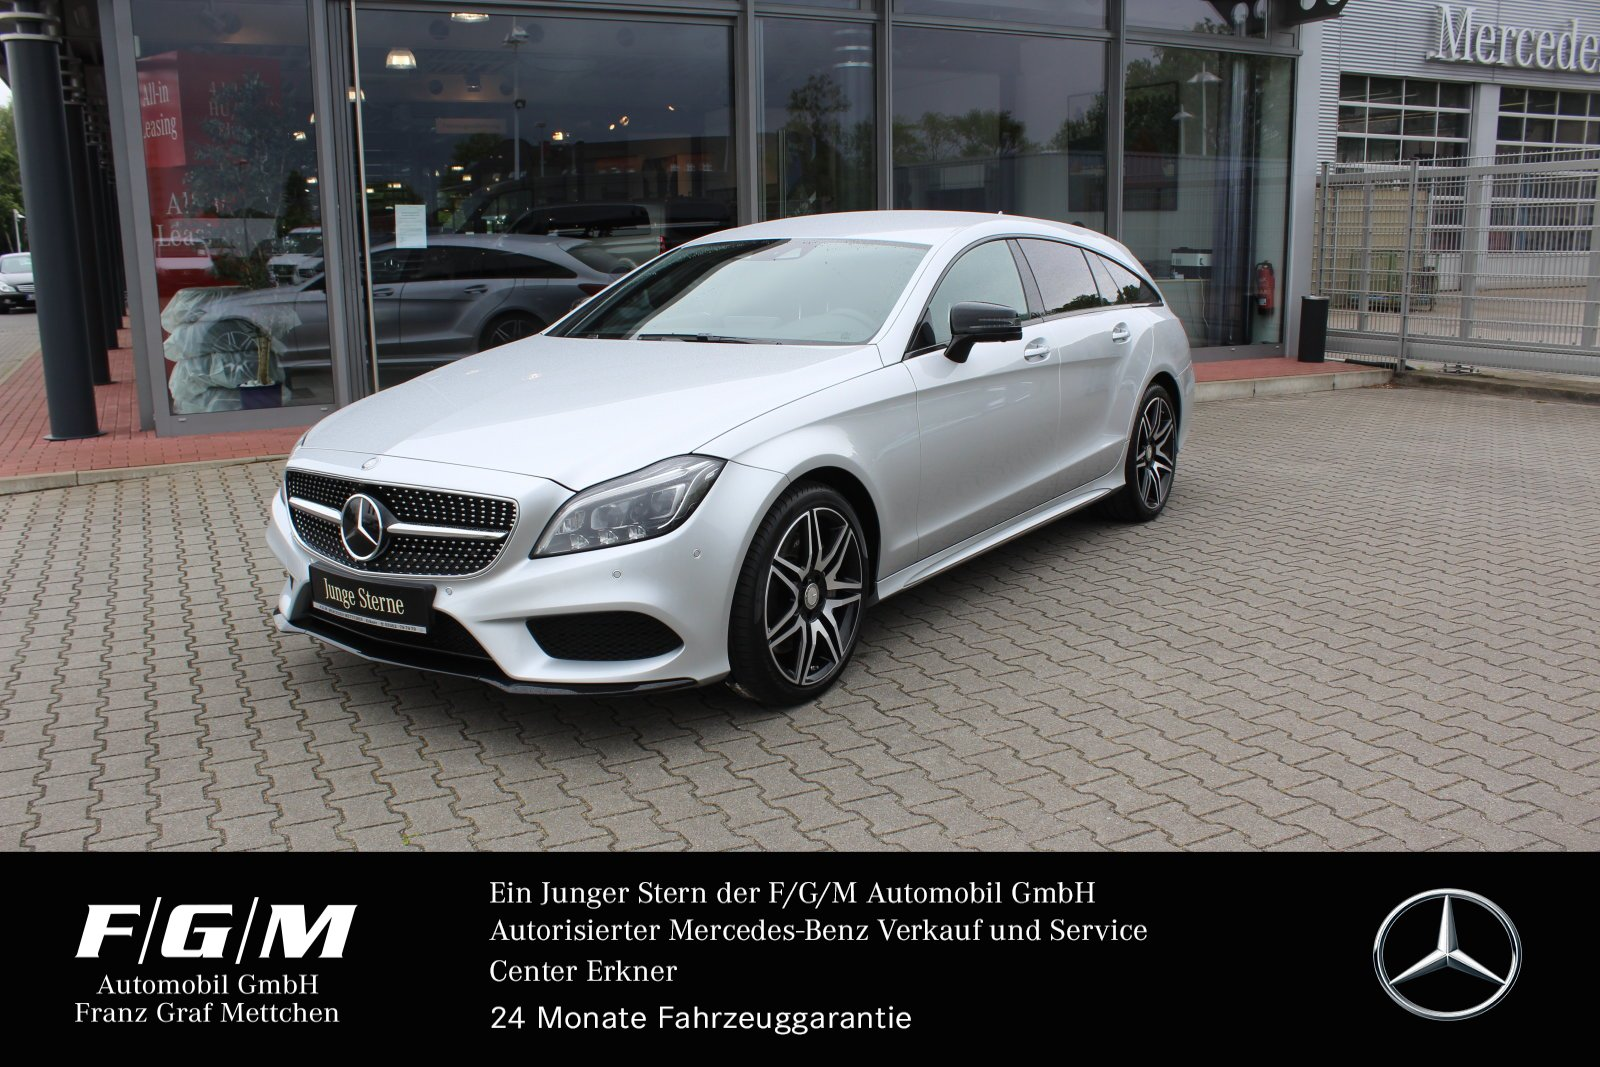 Mercedes-Benz CLS 500 4M SB AMG/COM/ILS/Distr/Standhzg/Memory, Jahr 2016, Benzin